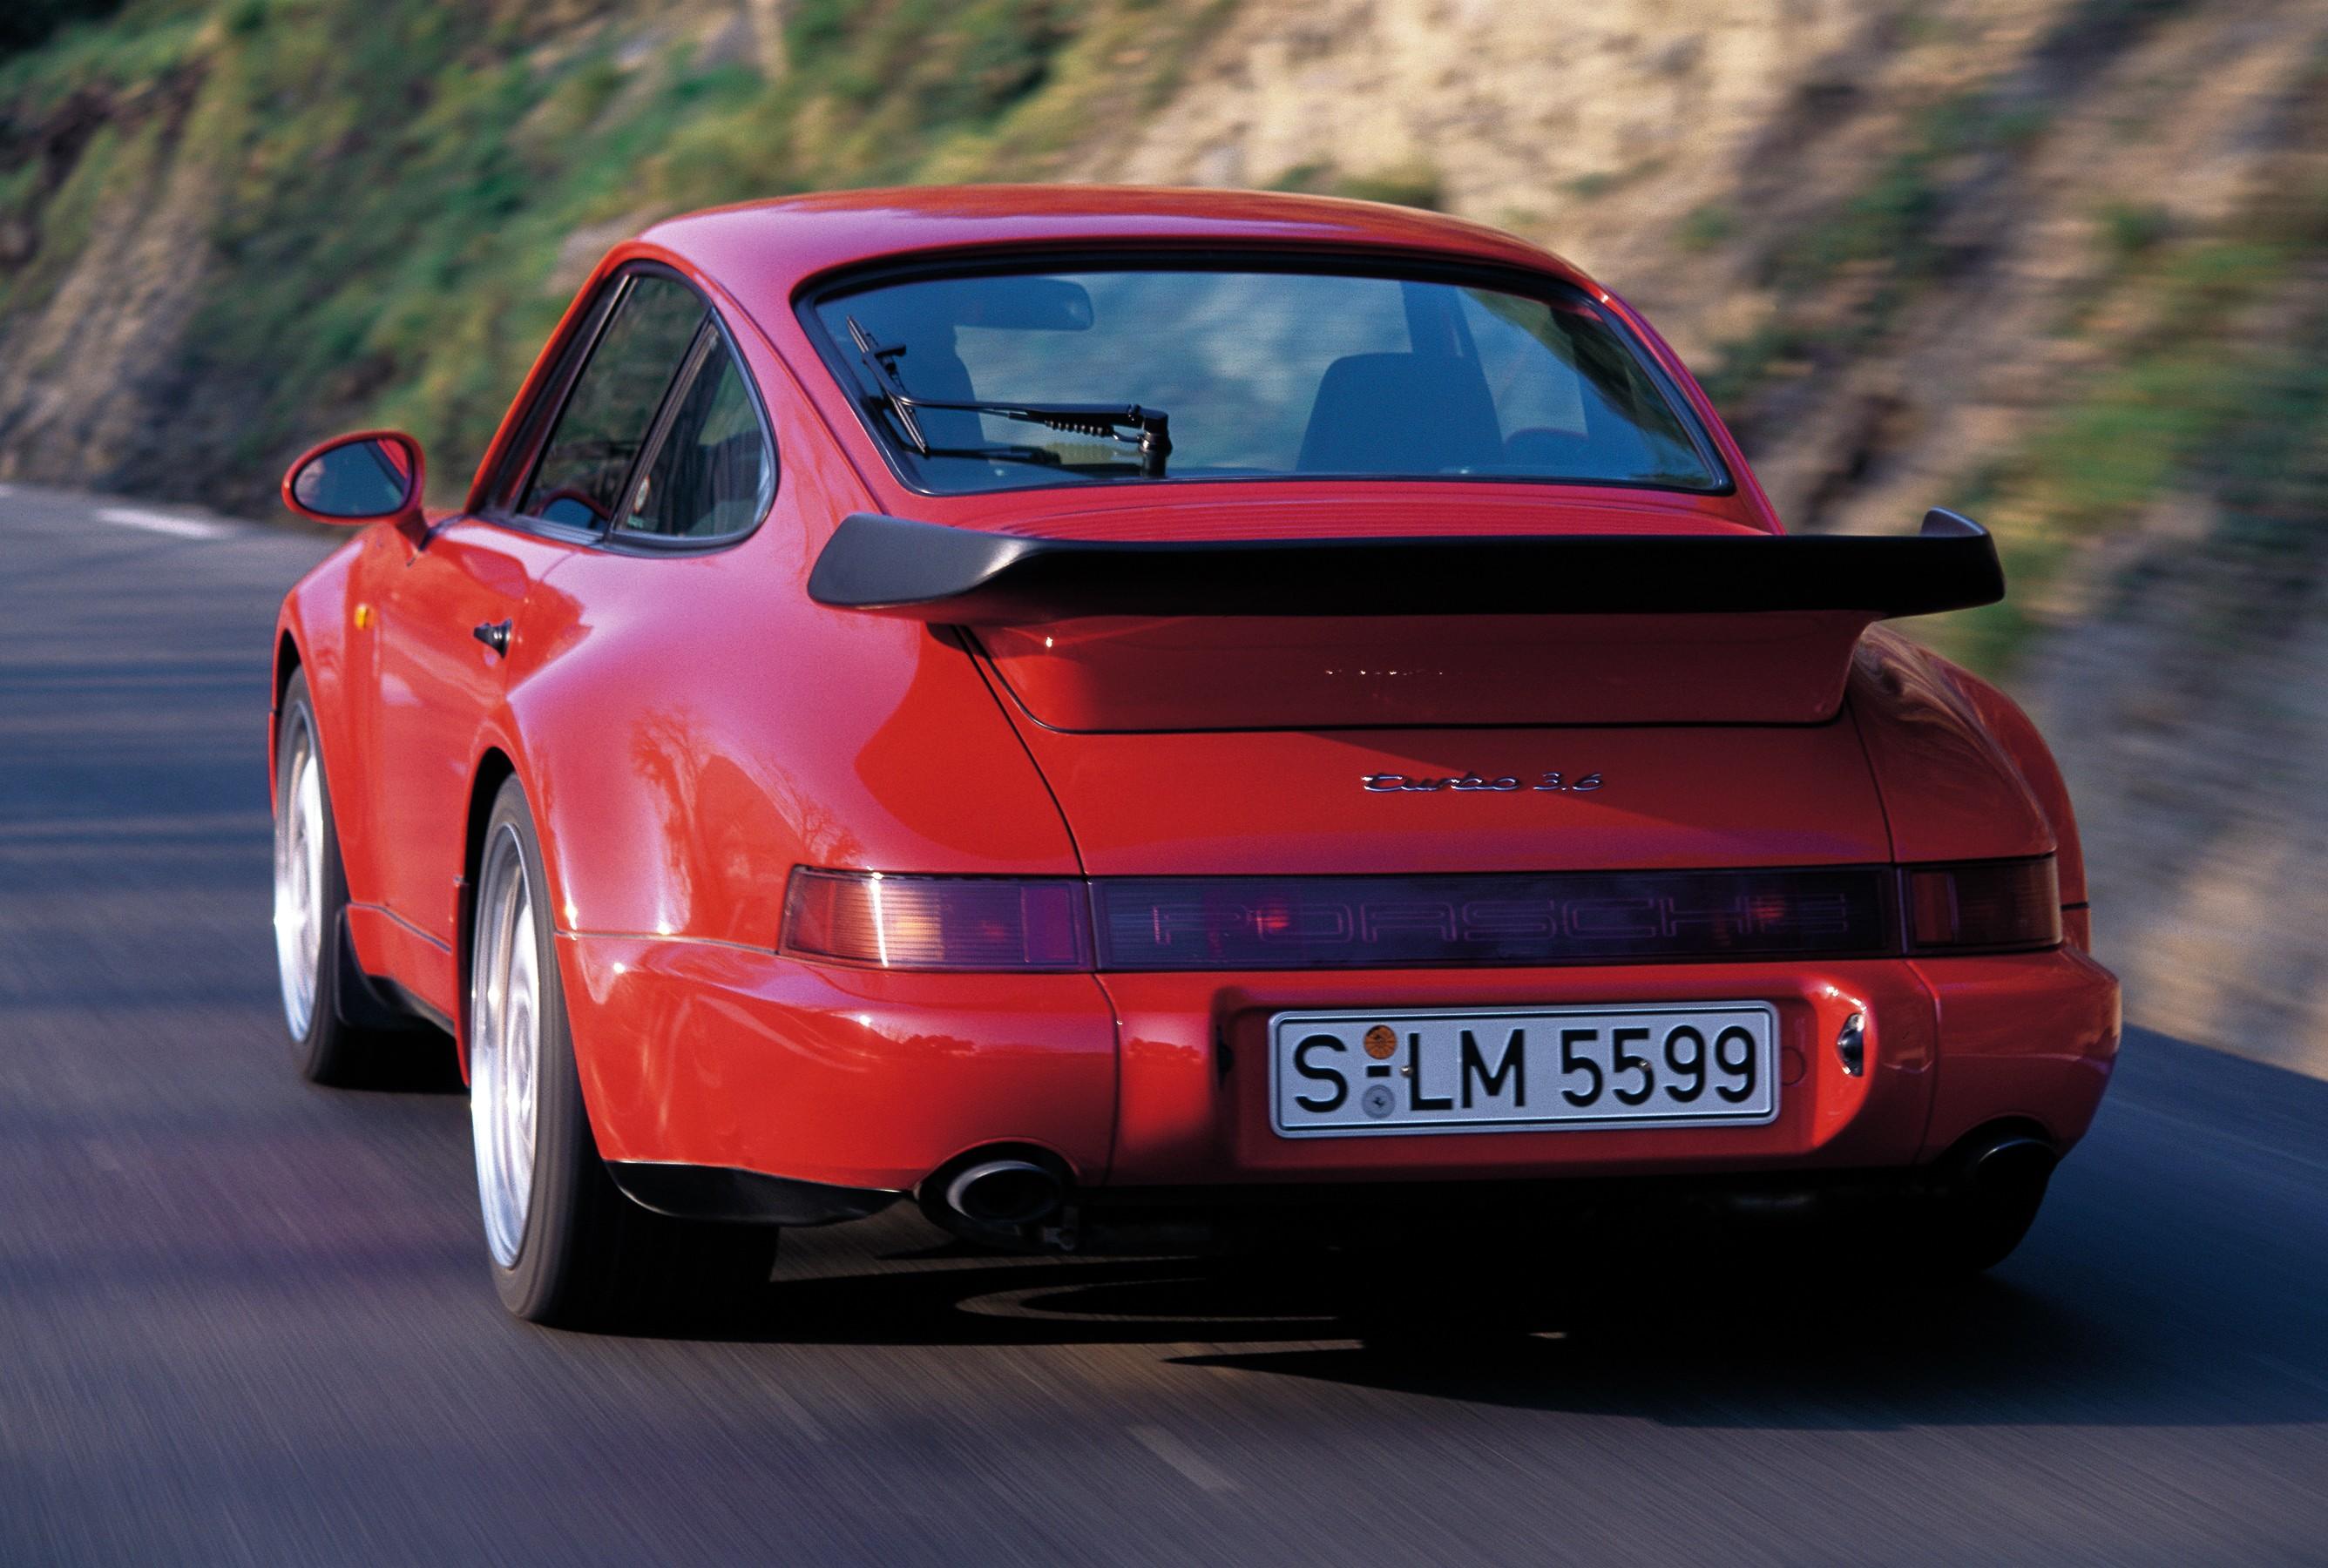 Porsche 911 Models >> PORSCHE 911 Turbo (964) specs & photos - 1990, 1991, 1992, 1993, 1994, 1995 - autoevolution